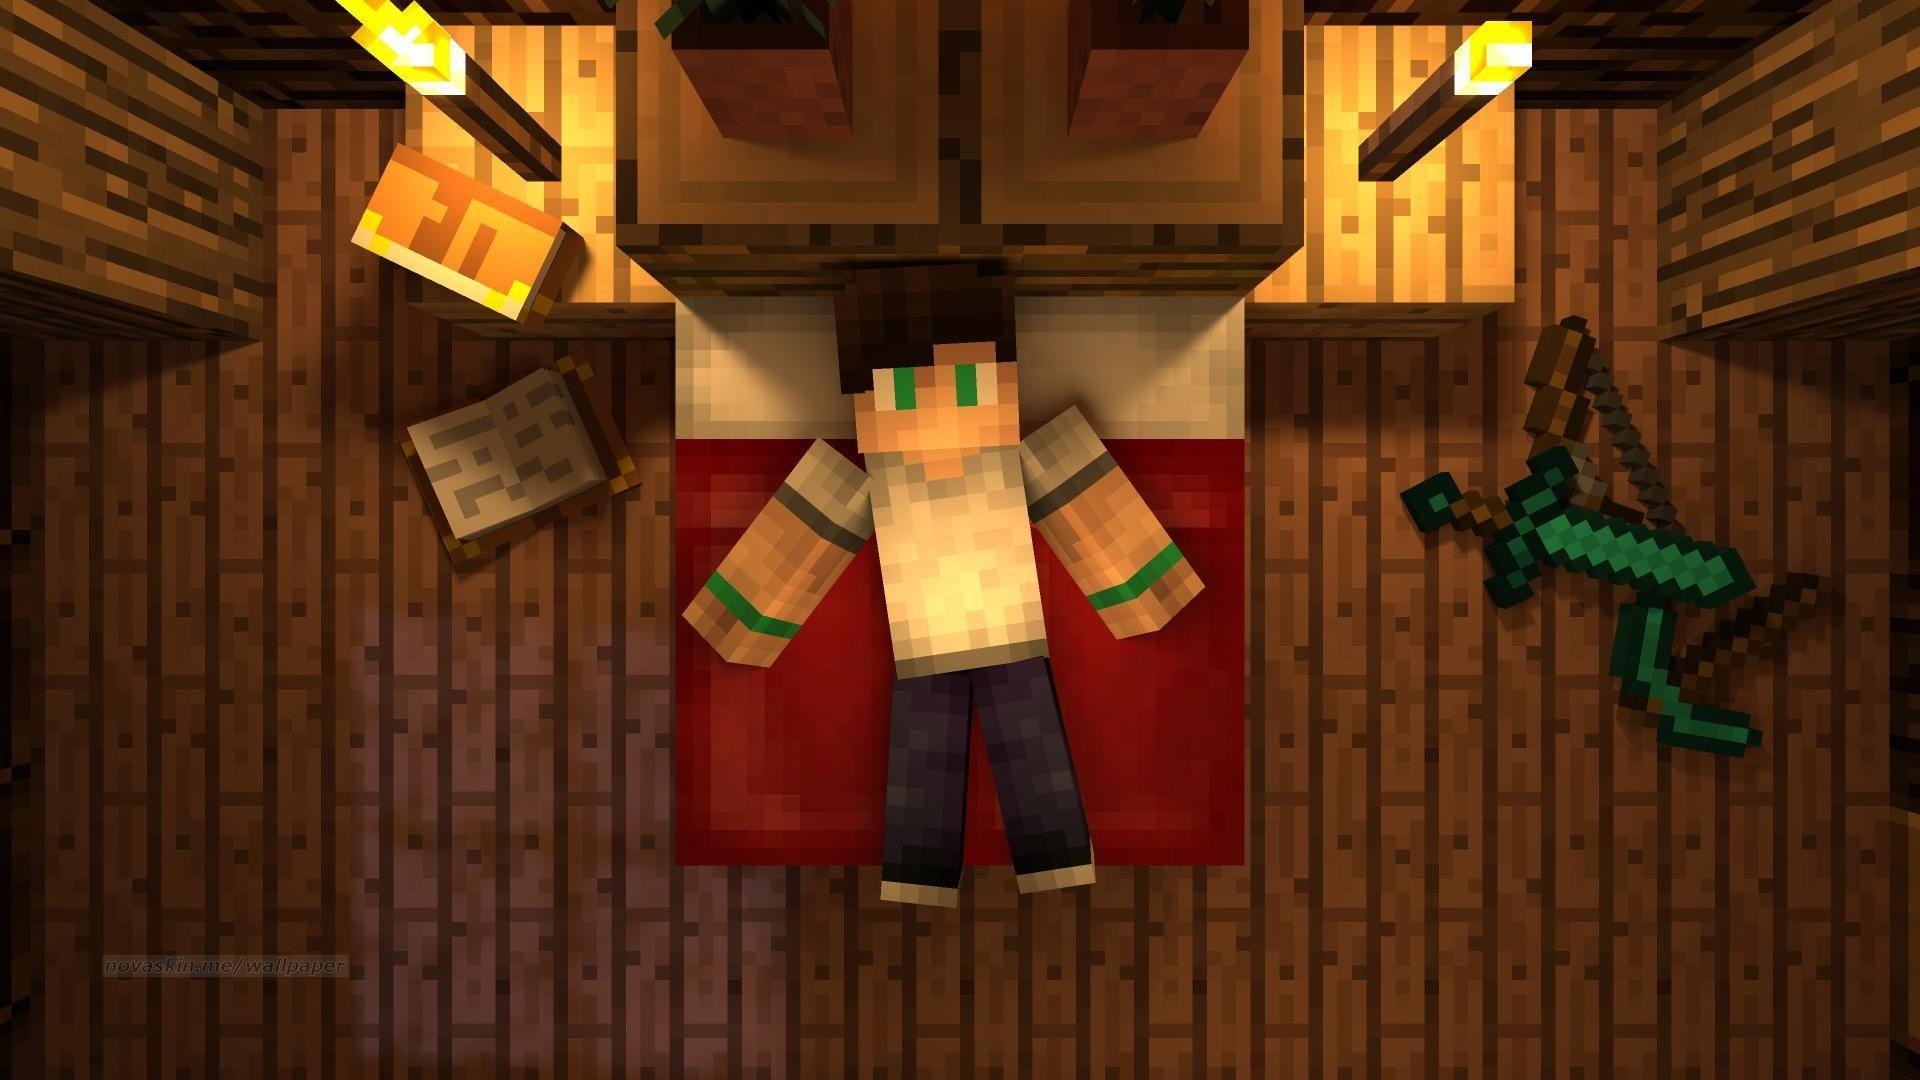 Minecraft 2016 wallpapers wallpaper cave - Minecraft wallpaper creator online ...